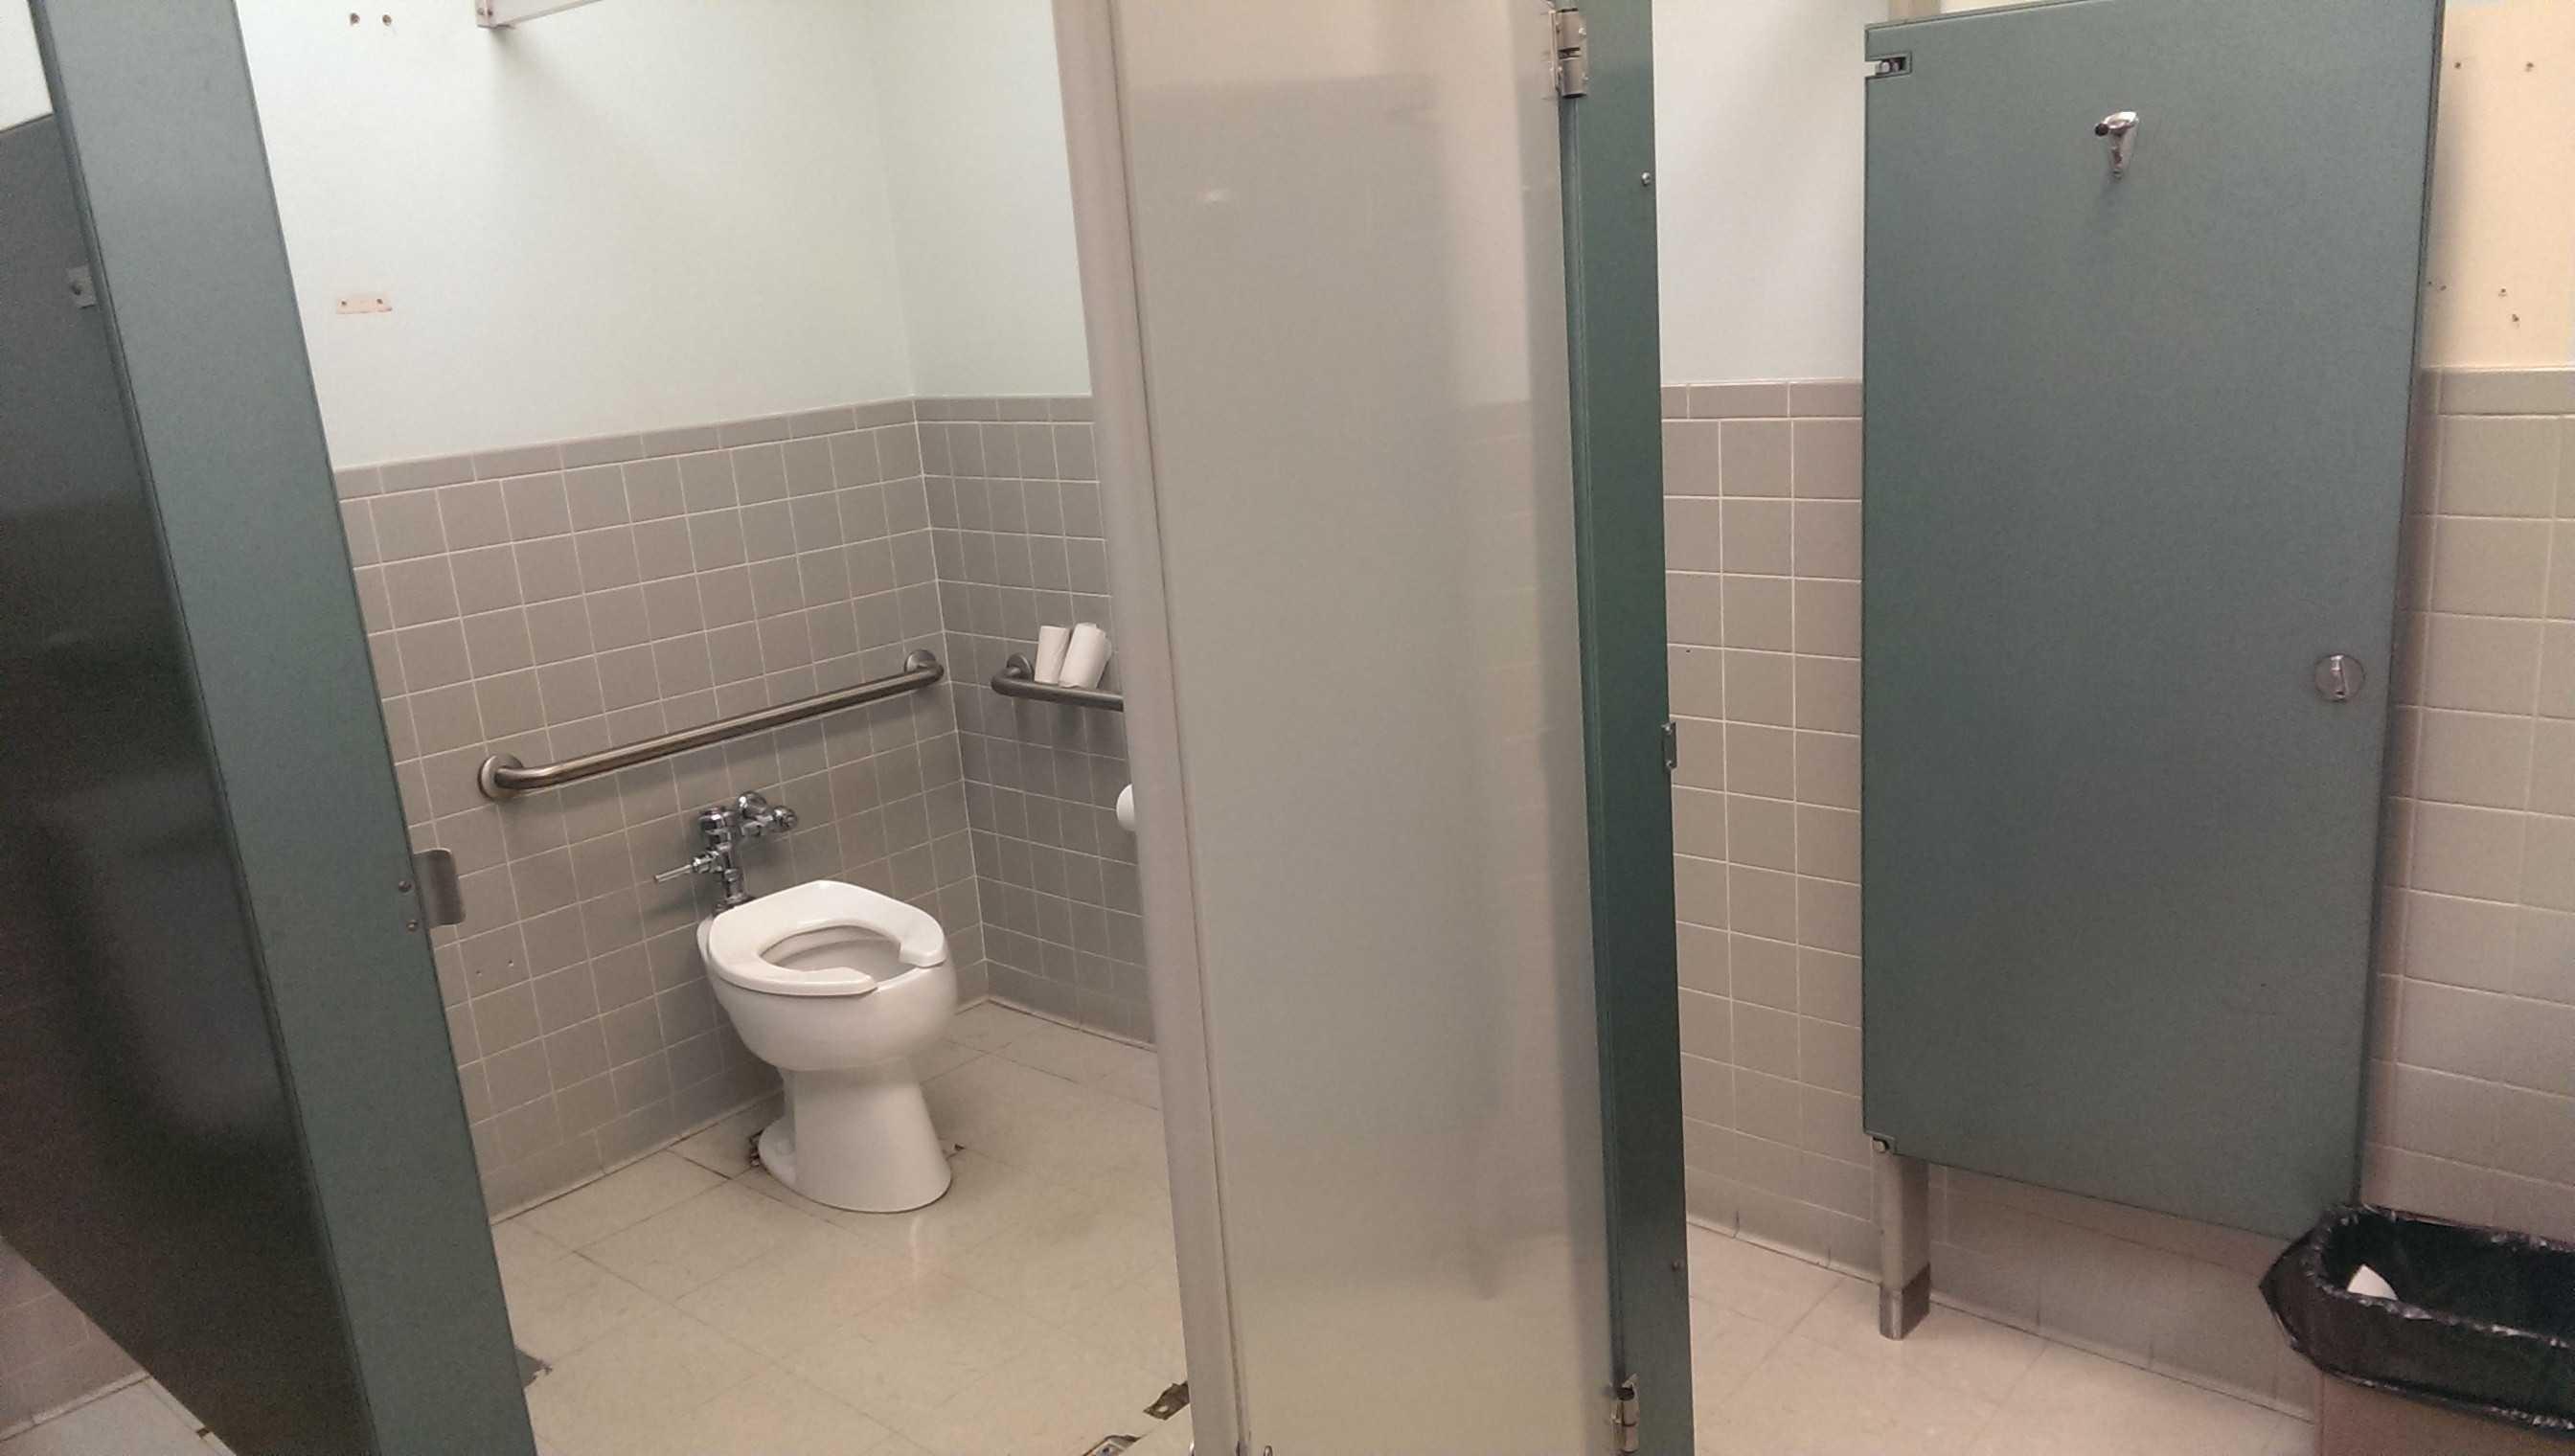 Wooden Bathroom Stall Doors Madison Art Center Design